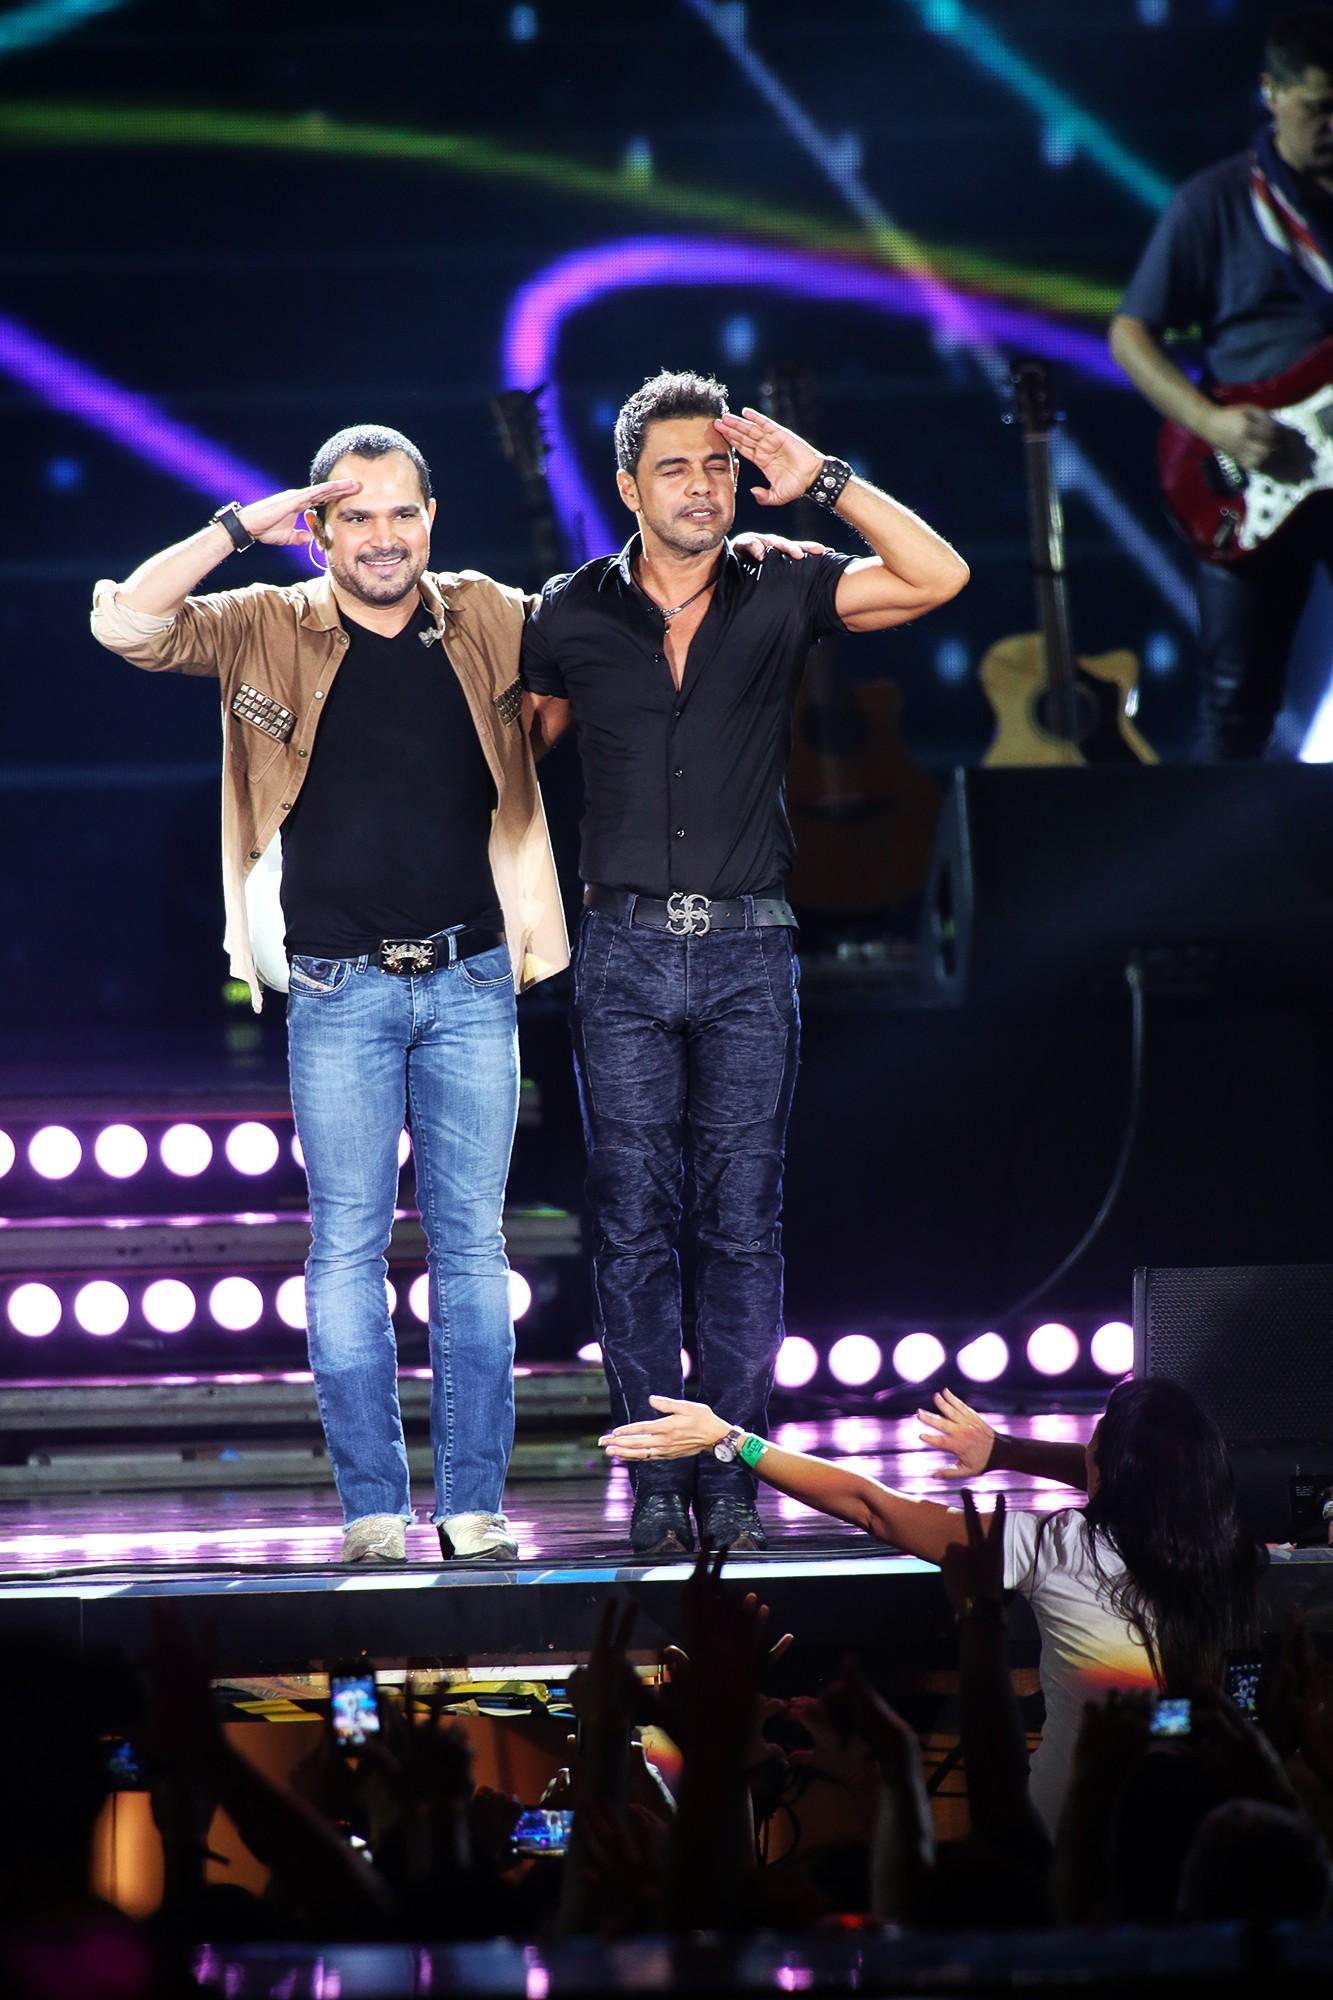 Zezé Di Camargo e Luciano (Foto: Globo/ Rubens Cerqueira)